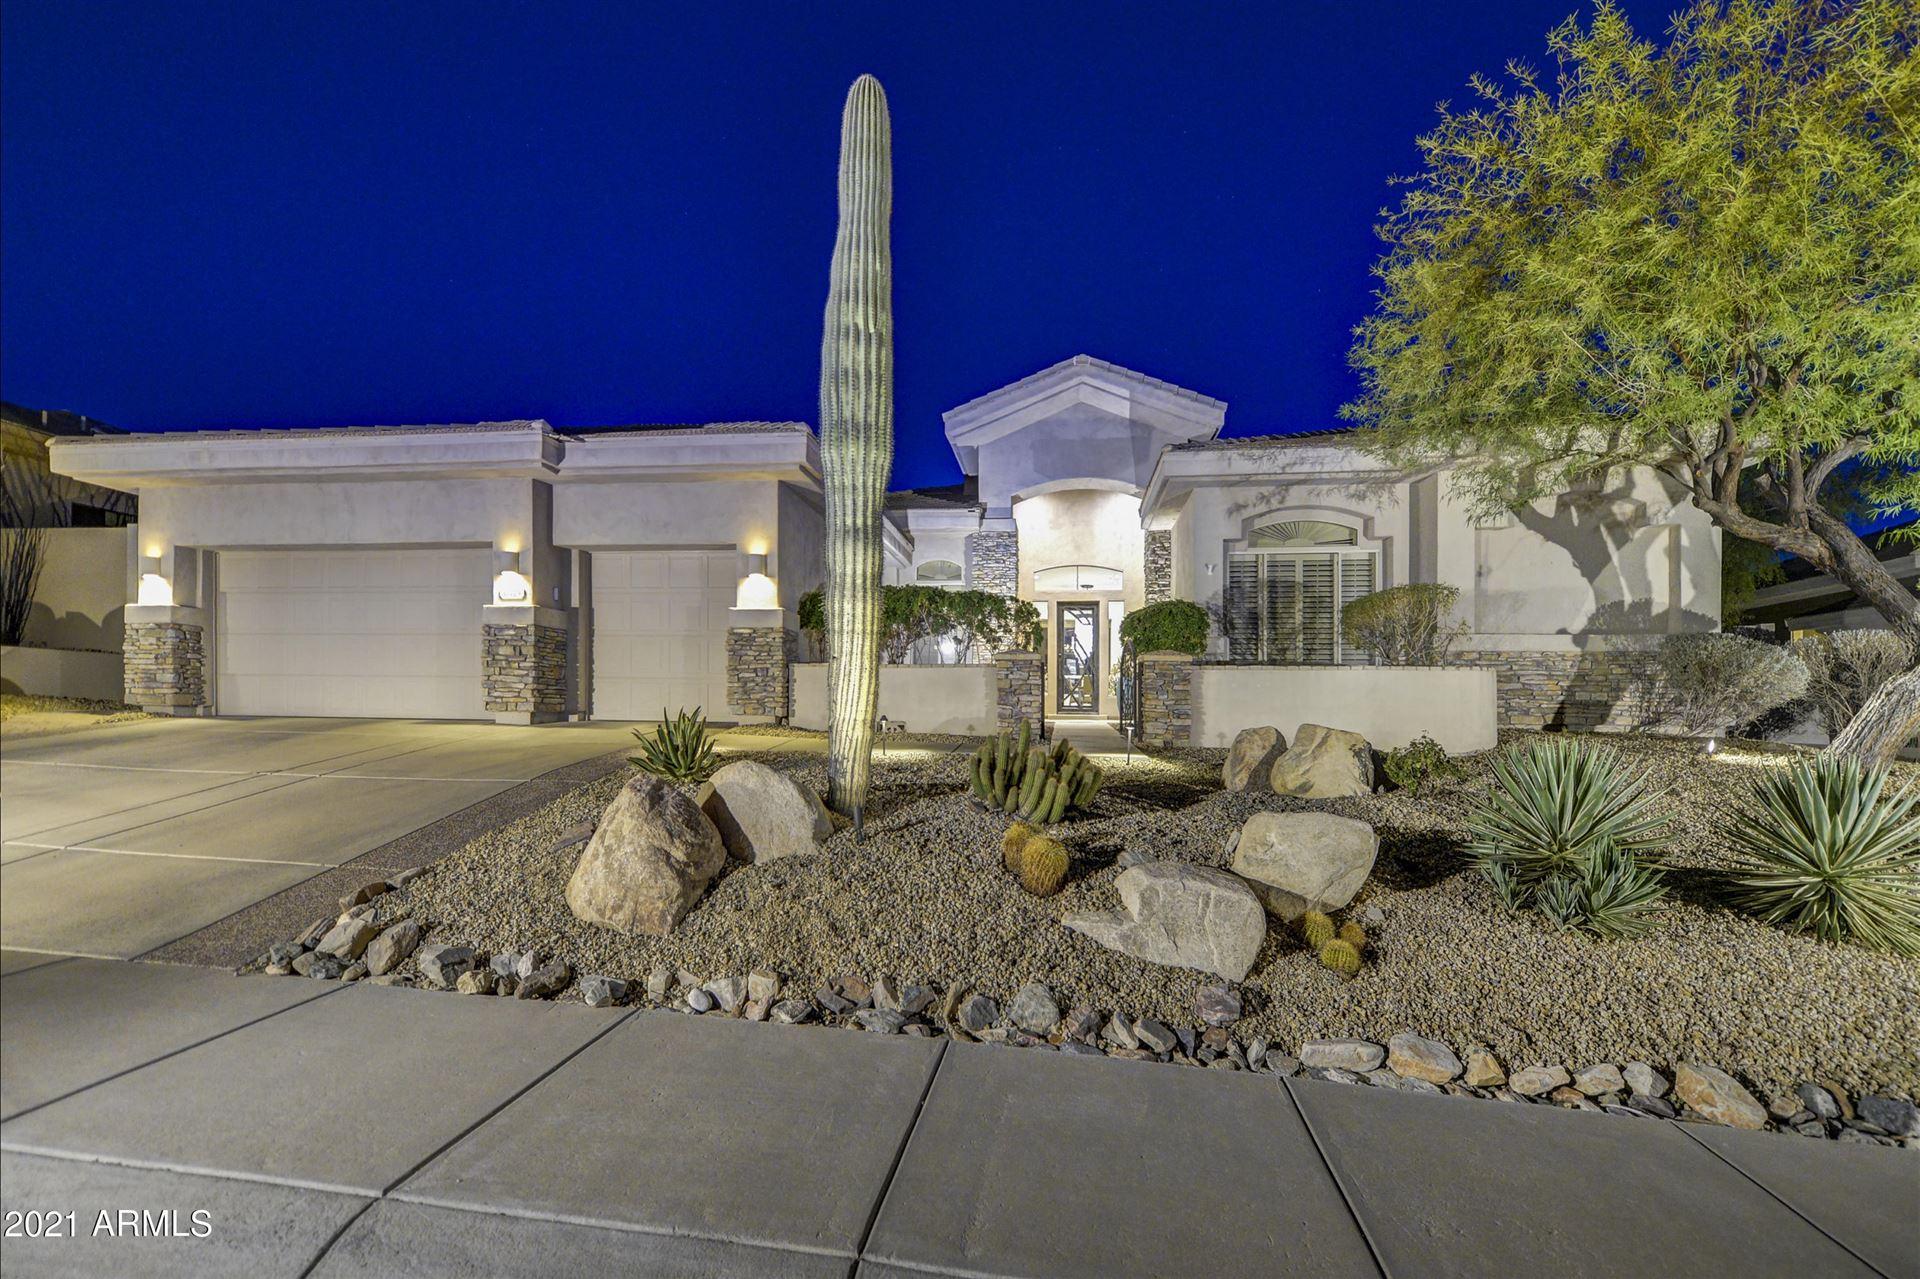 Photo of 10729 E ACOMA Drive, Scottsdale, AZ 85255 (MLS # 6202313)